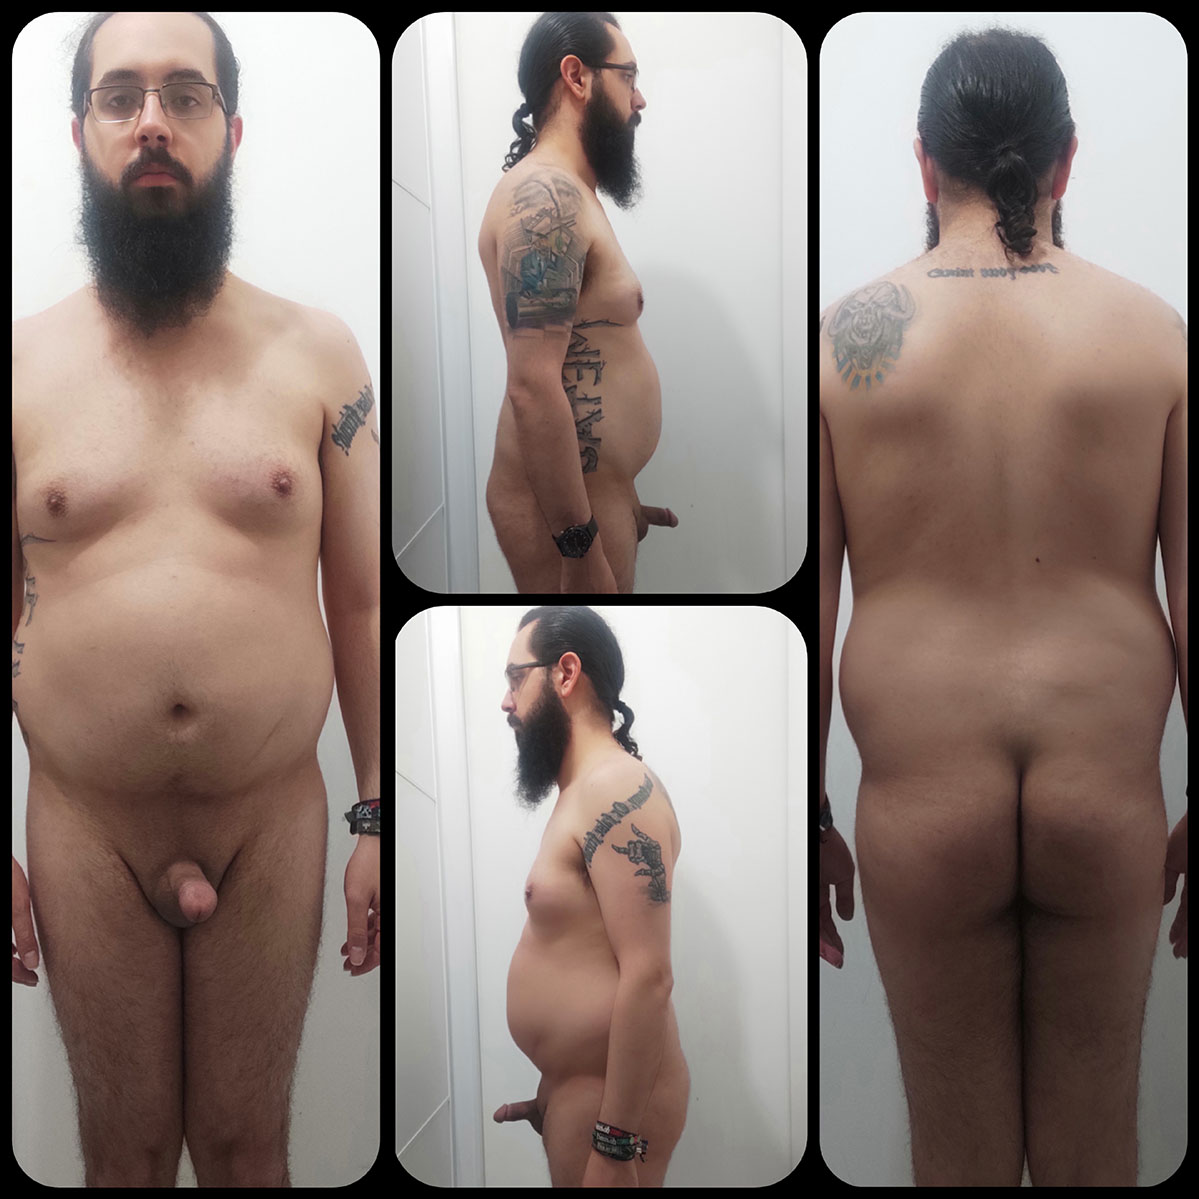 Eliran R. | Tiny Dick Loser